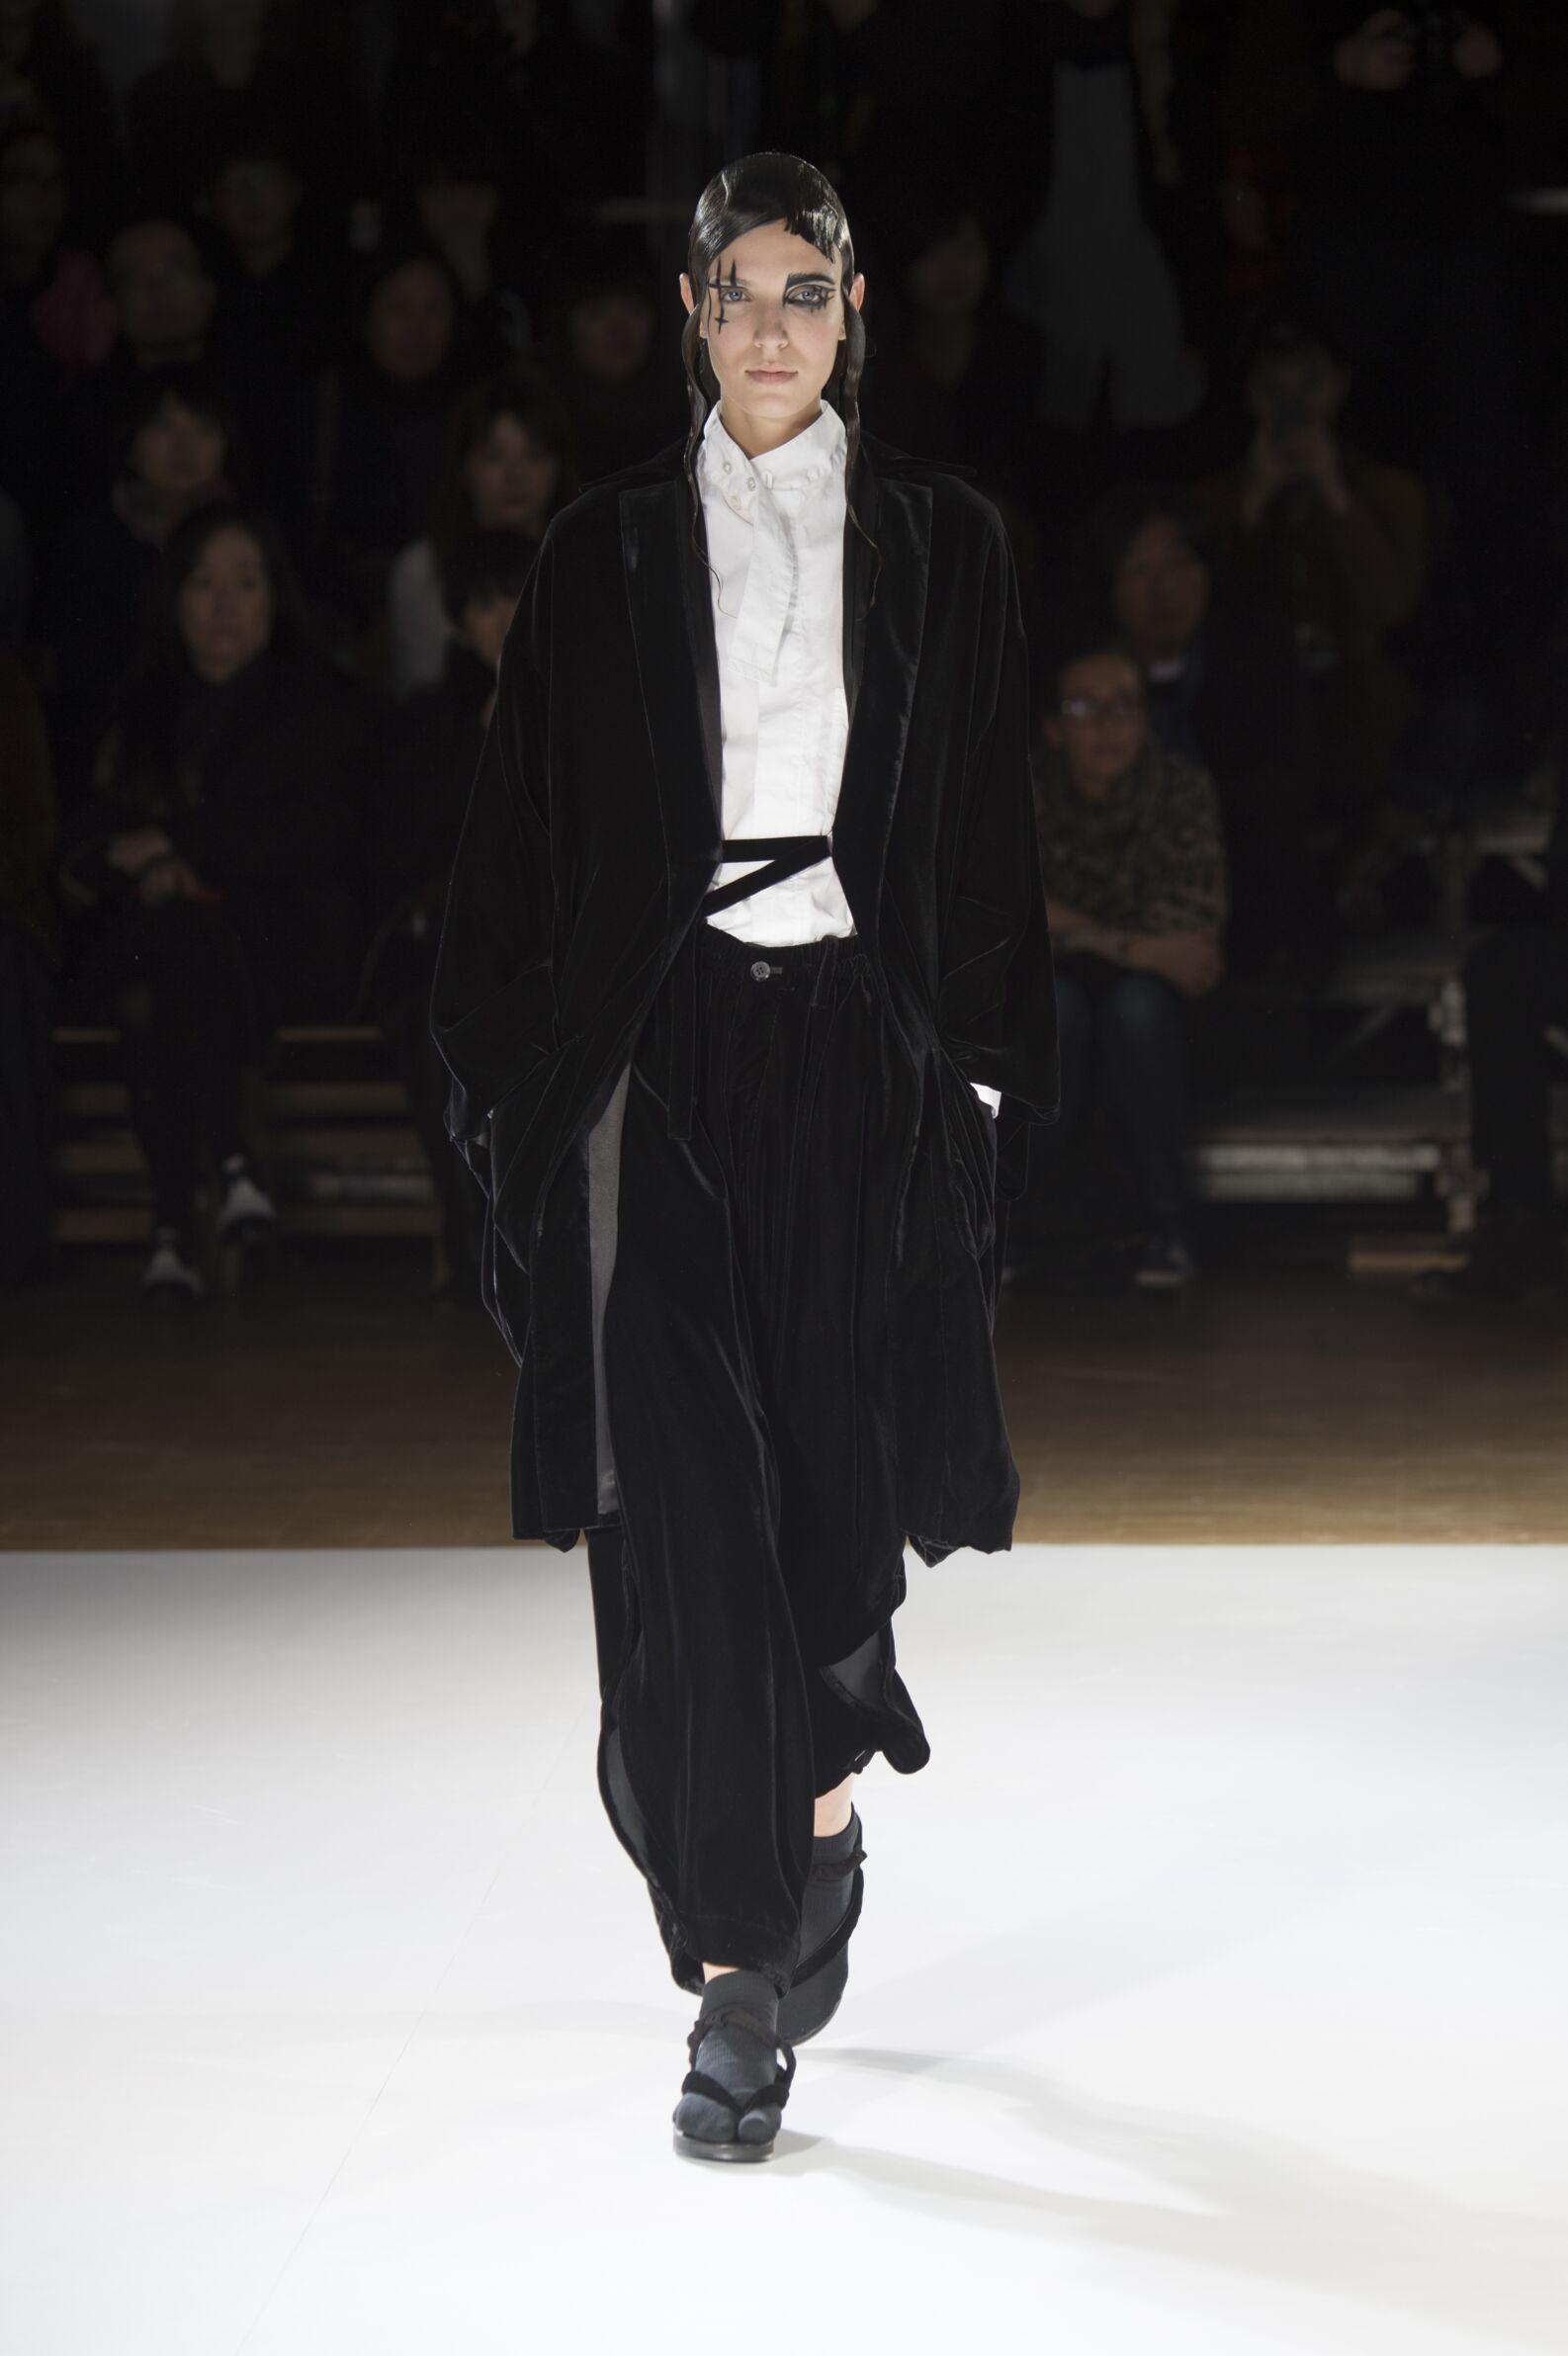 Yohji Yamamoto Fall Winter 2015 16 Womens Collection Paris Fashion Week